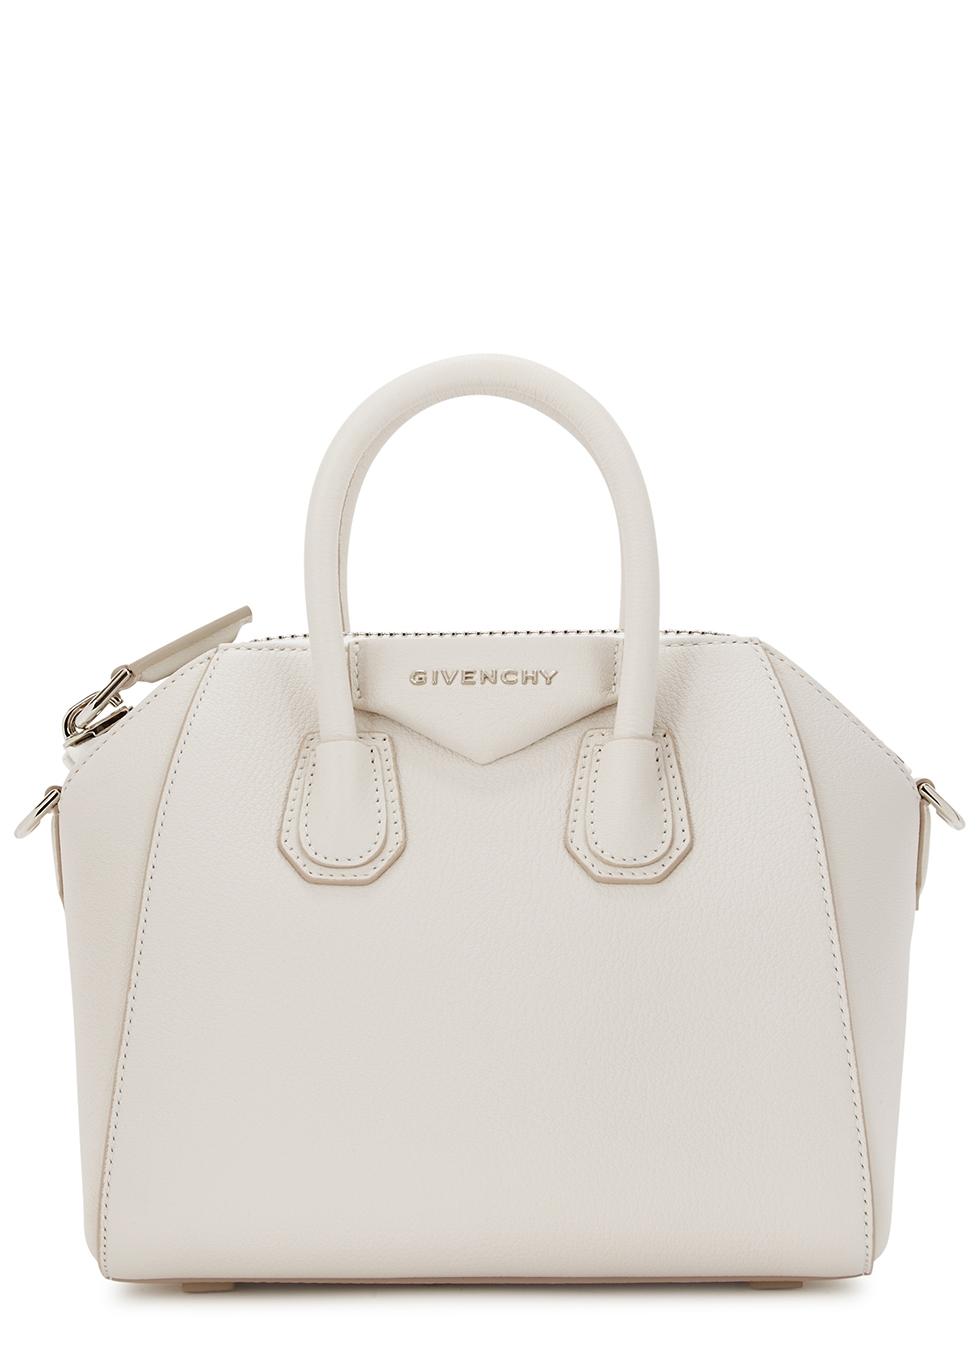 46fa8711d7 Givenchy - Designer Clothing, Bags, Scarves - Harvey Nichols